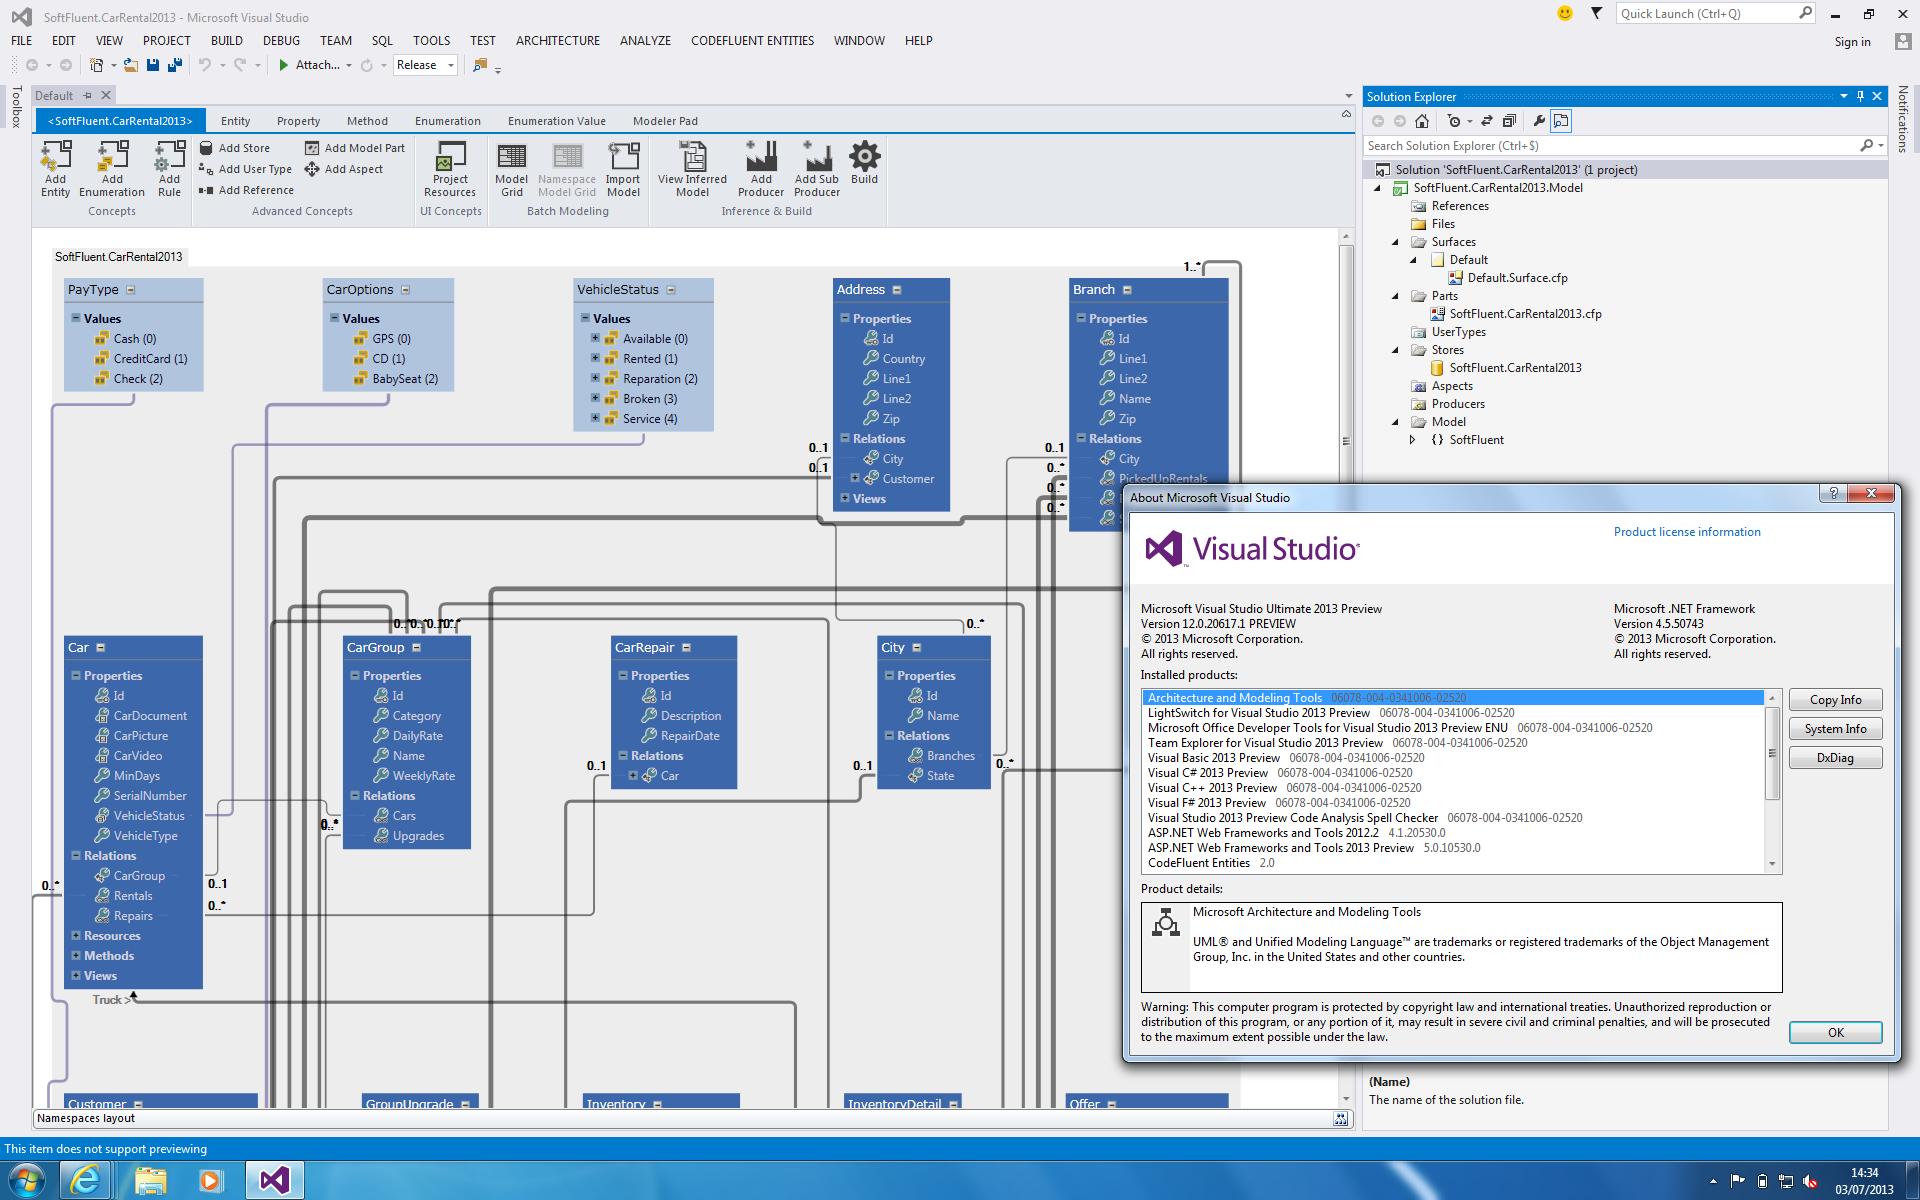 Visual Studio | The CodeFluent Entities Blog